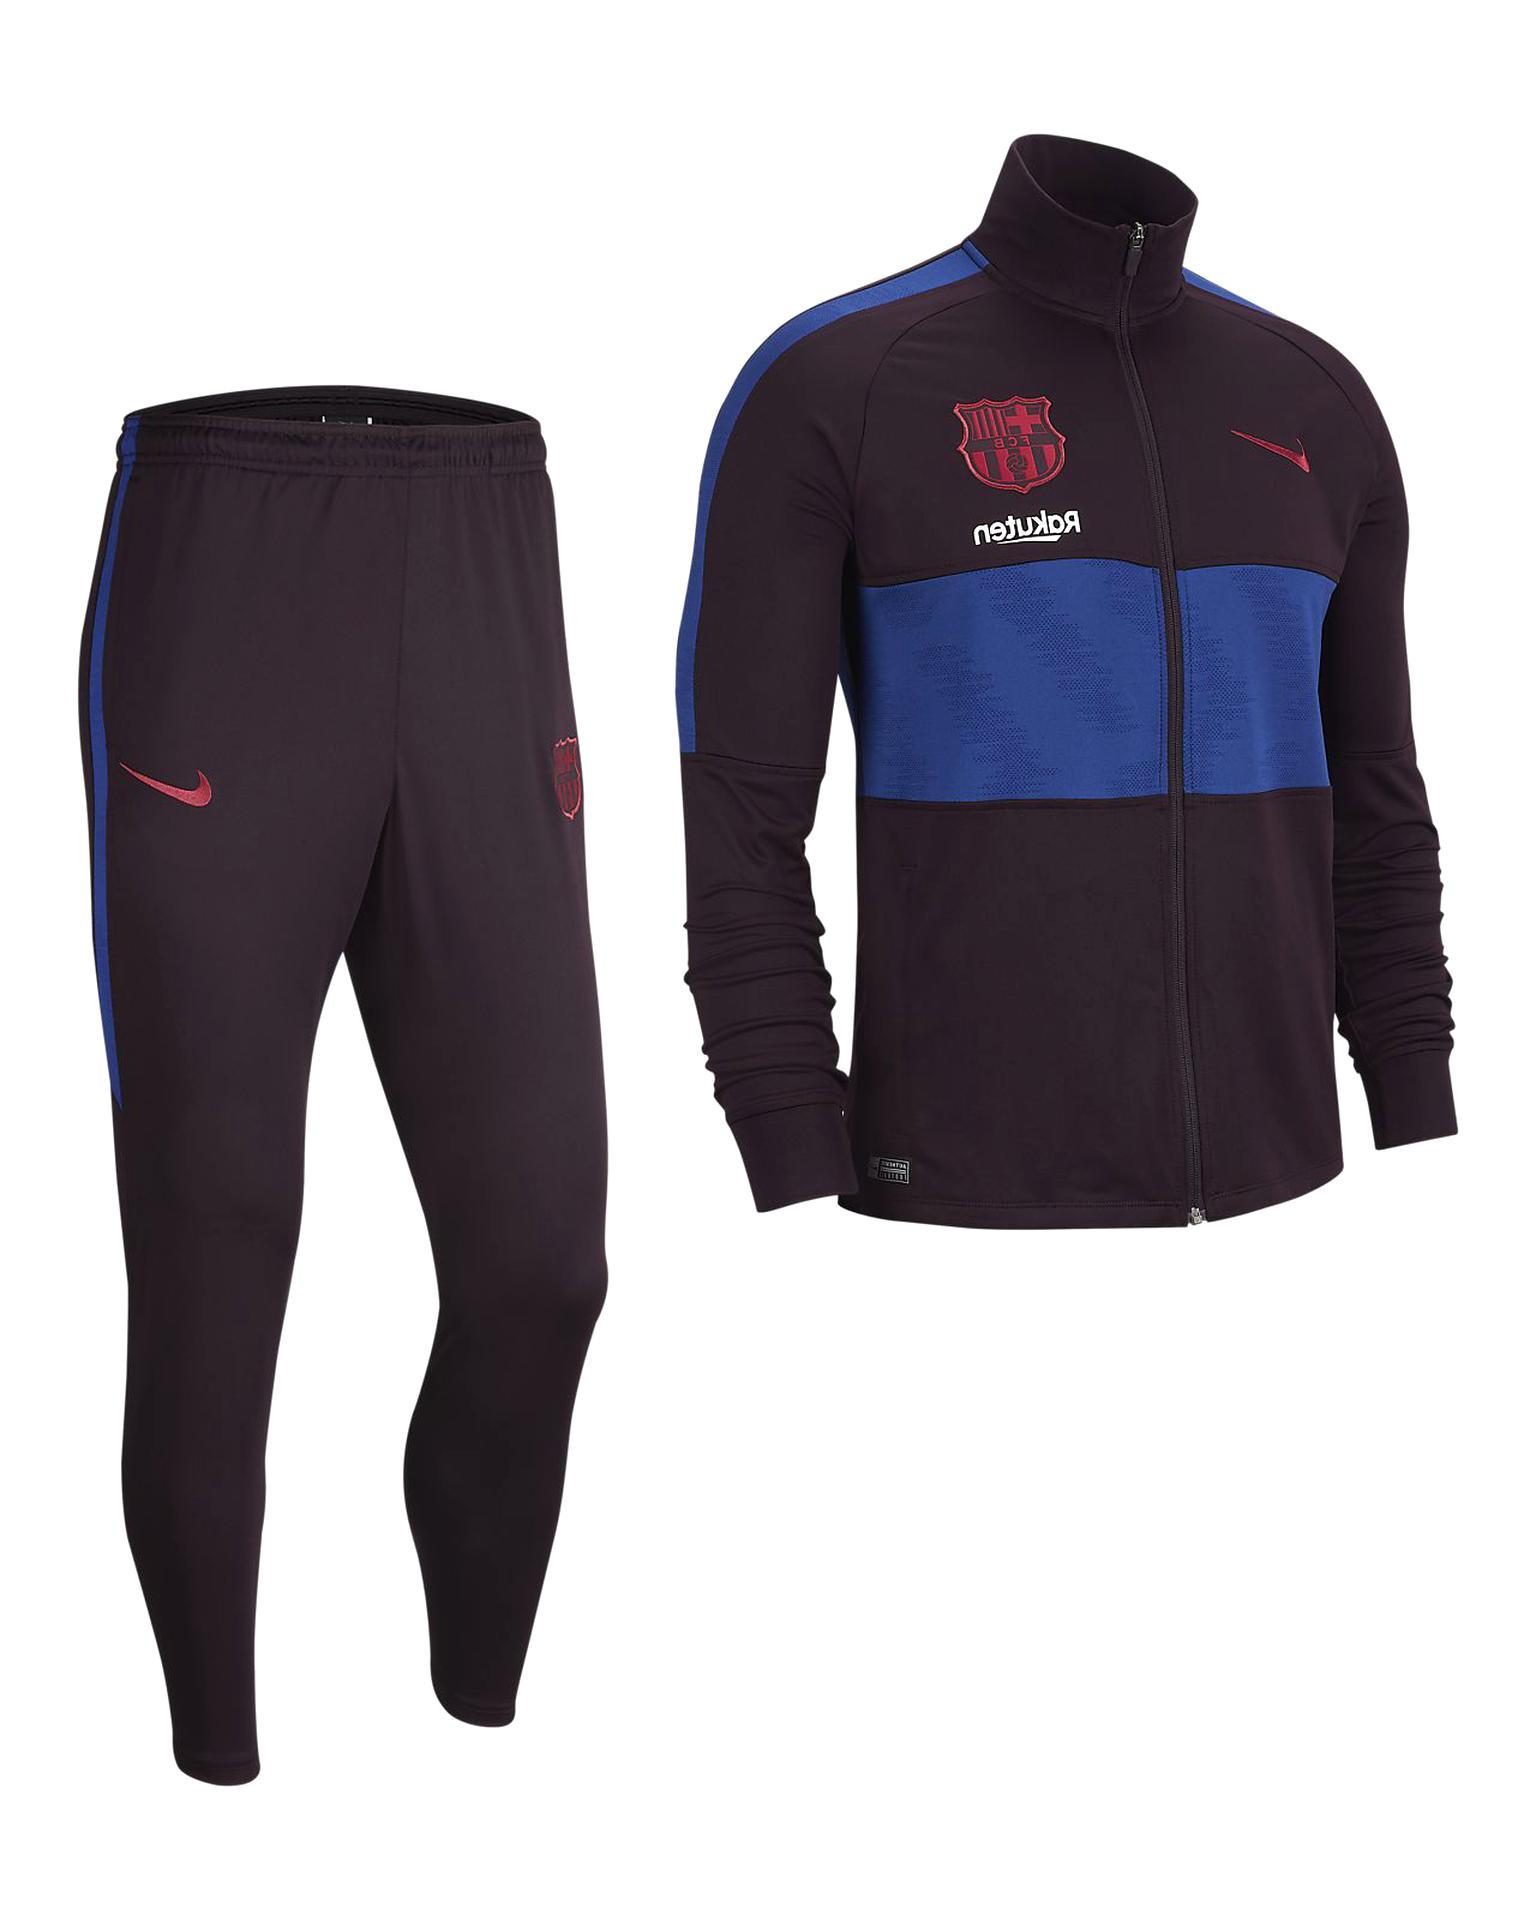 fc barcelona trainingsanzug gebraucht kaufen